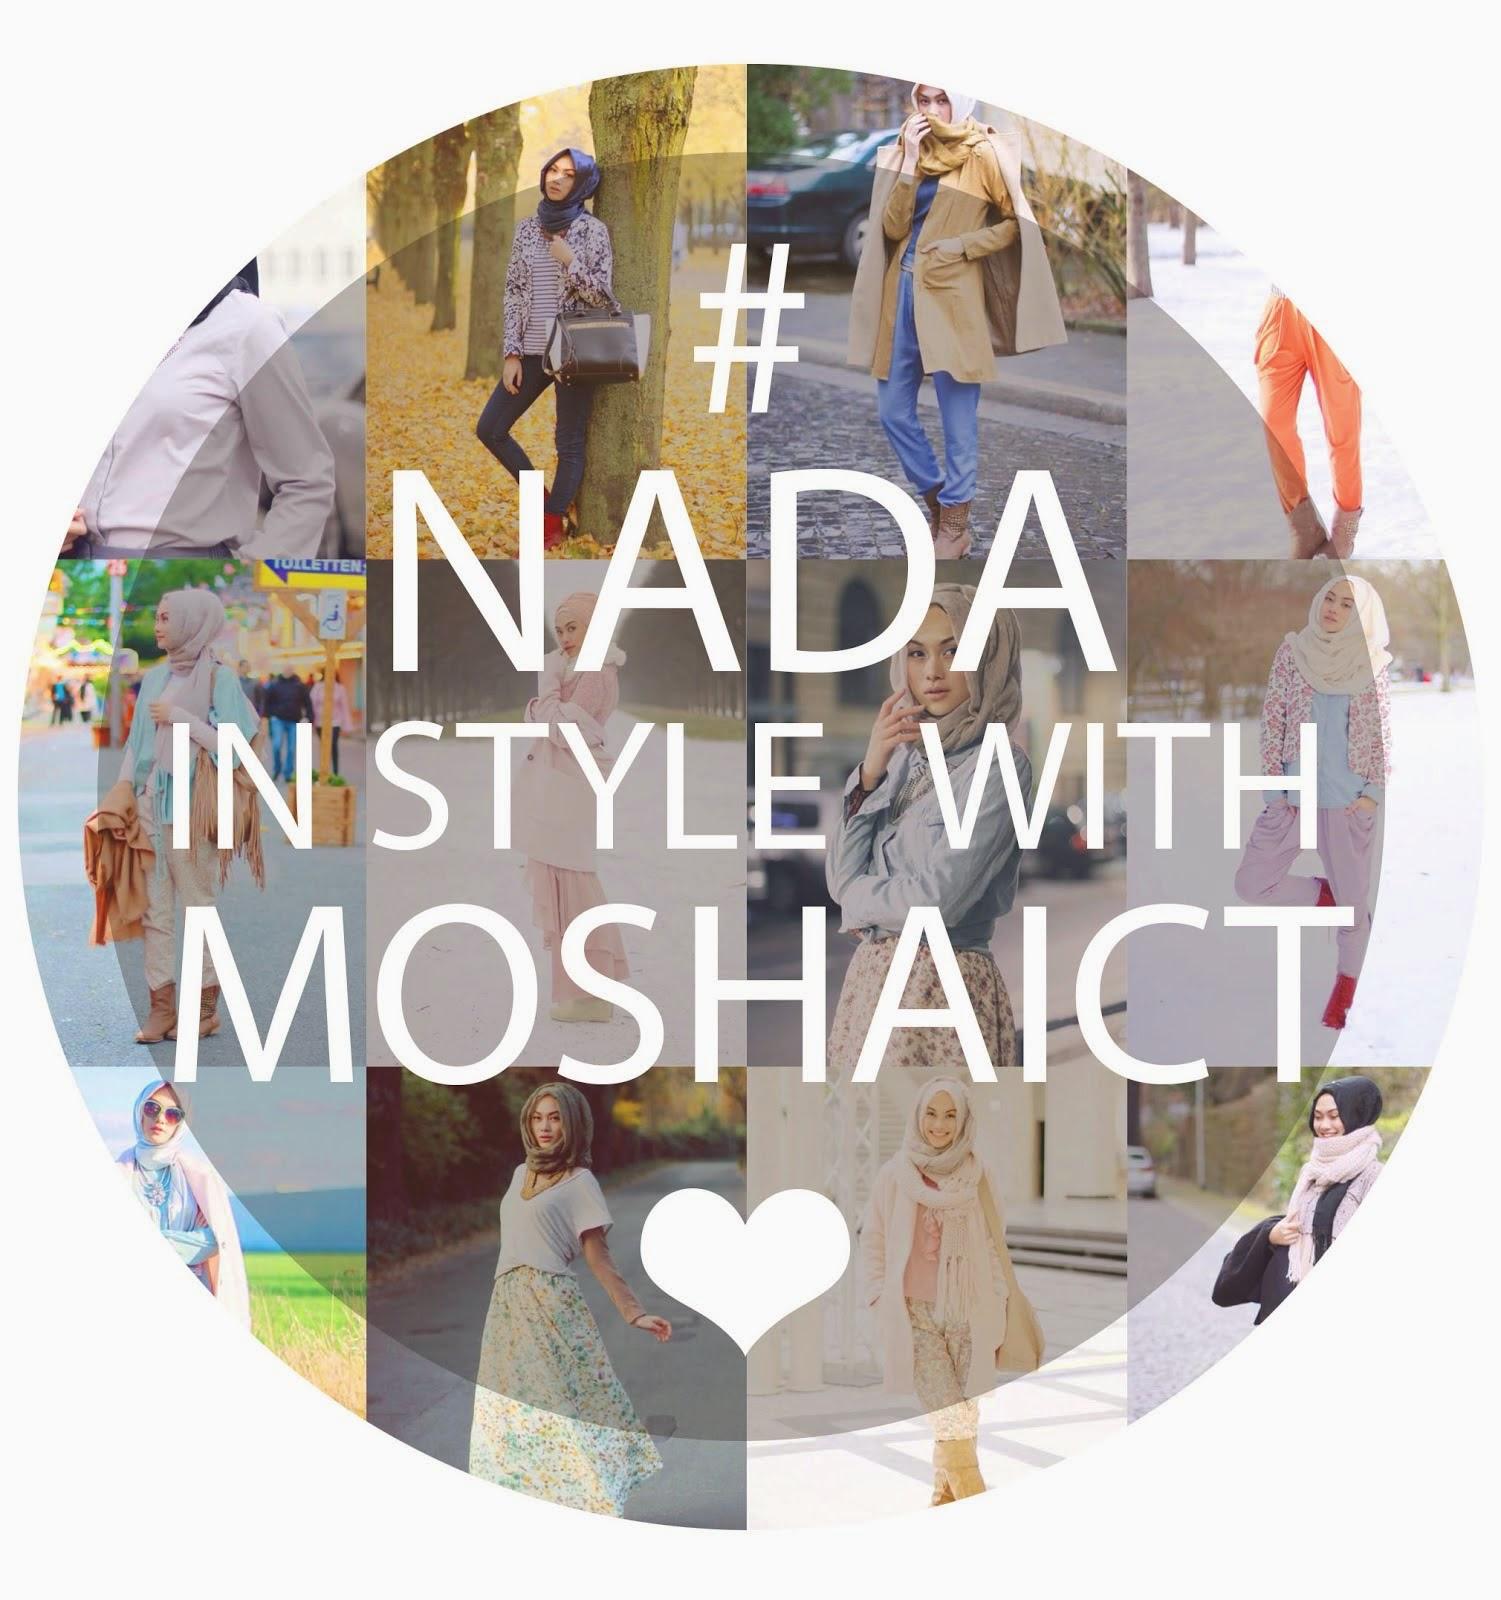 NADA x MOSHAICT